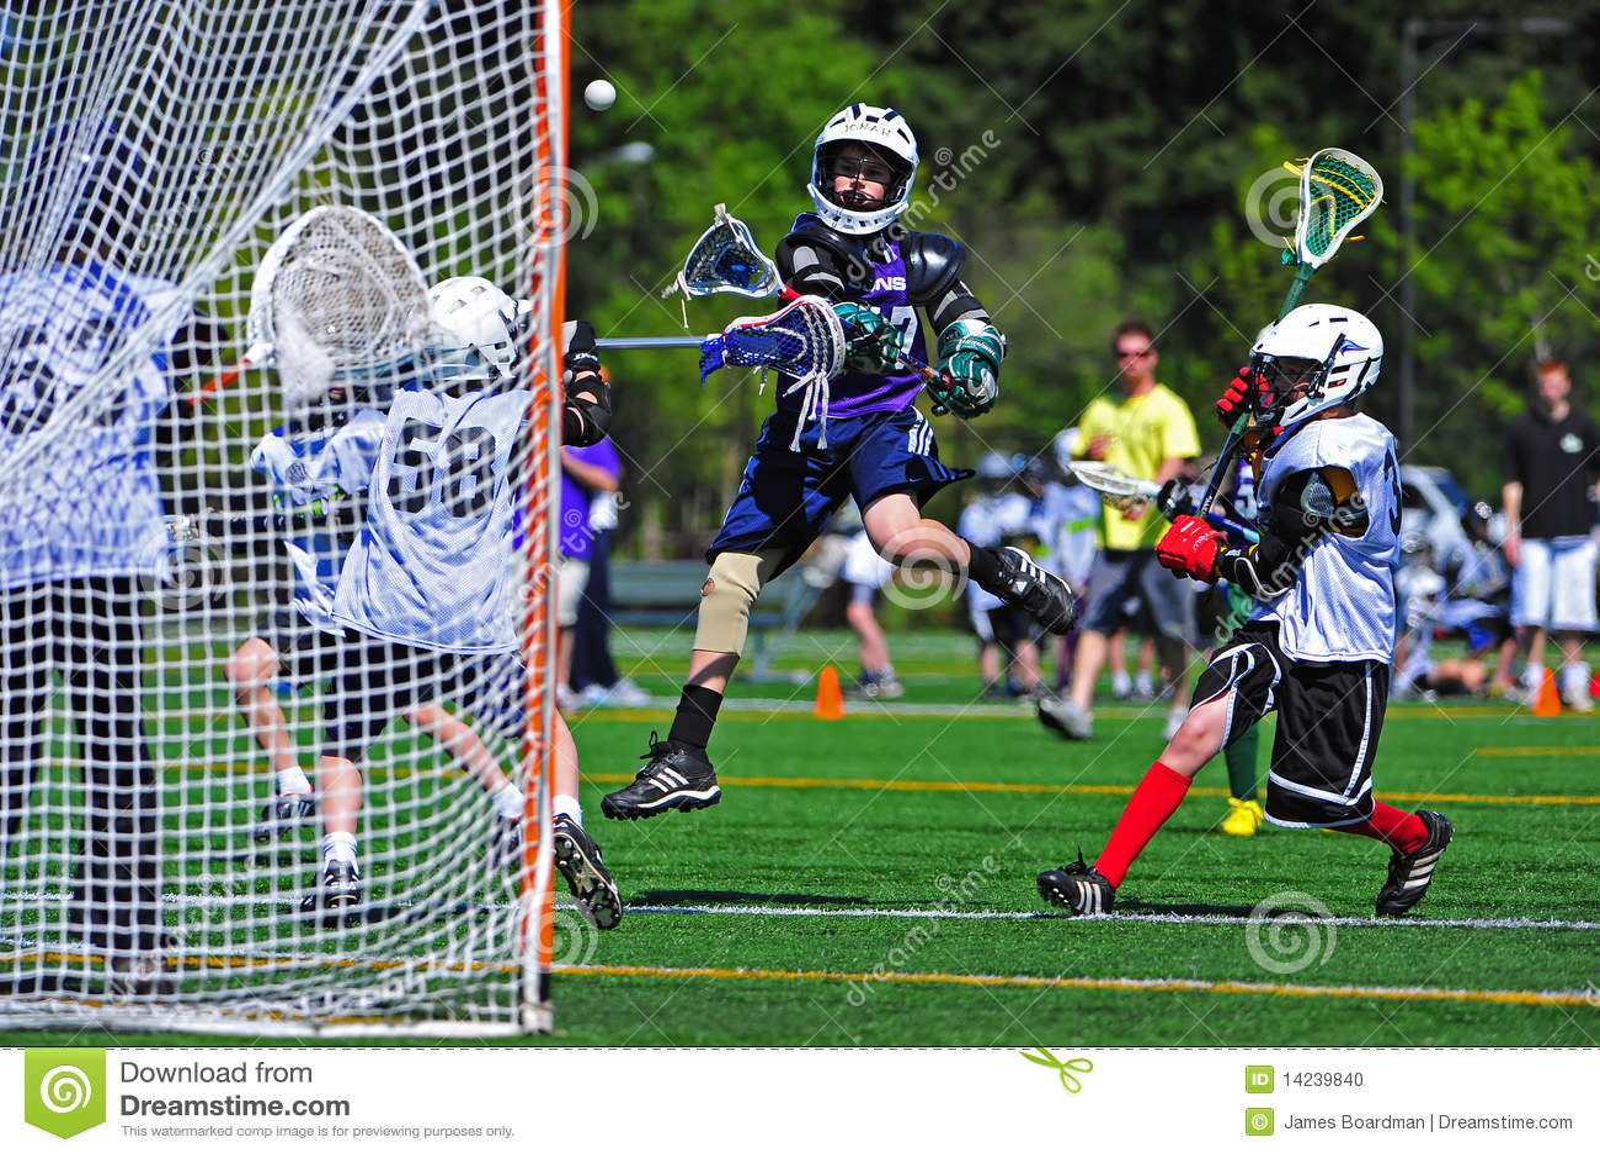 Contrôle de Lacrosse de la jeunesse de garçons